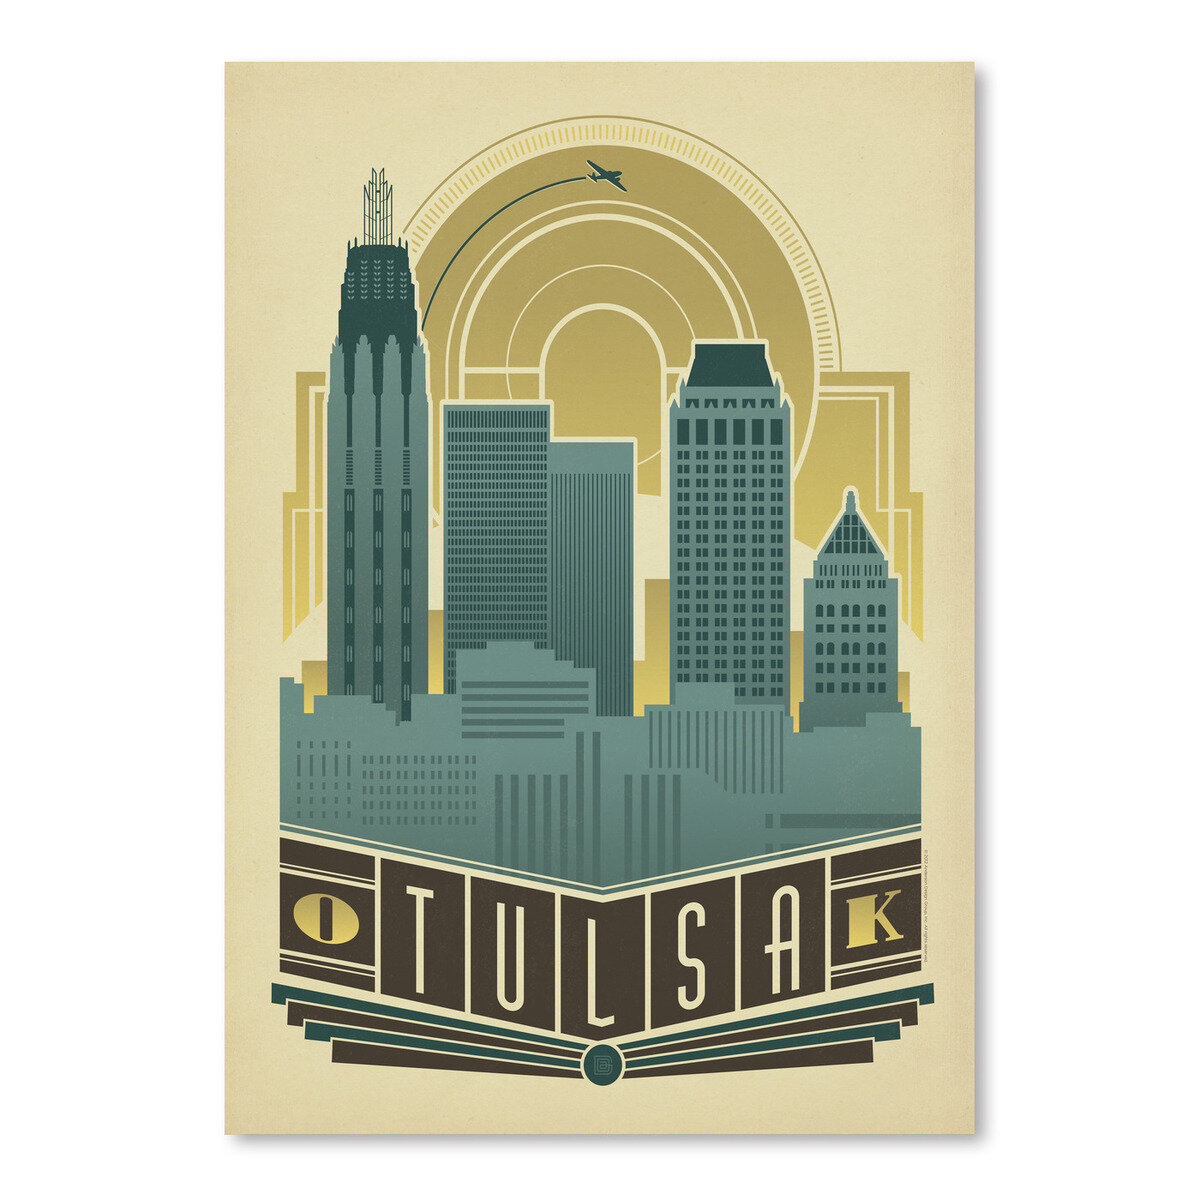 Home Decor Tulsa: East Urban Home Tulsa Decor Skyline Vintage Advertisement